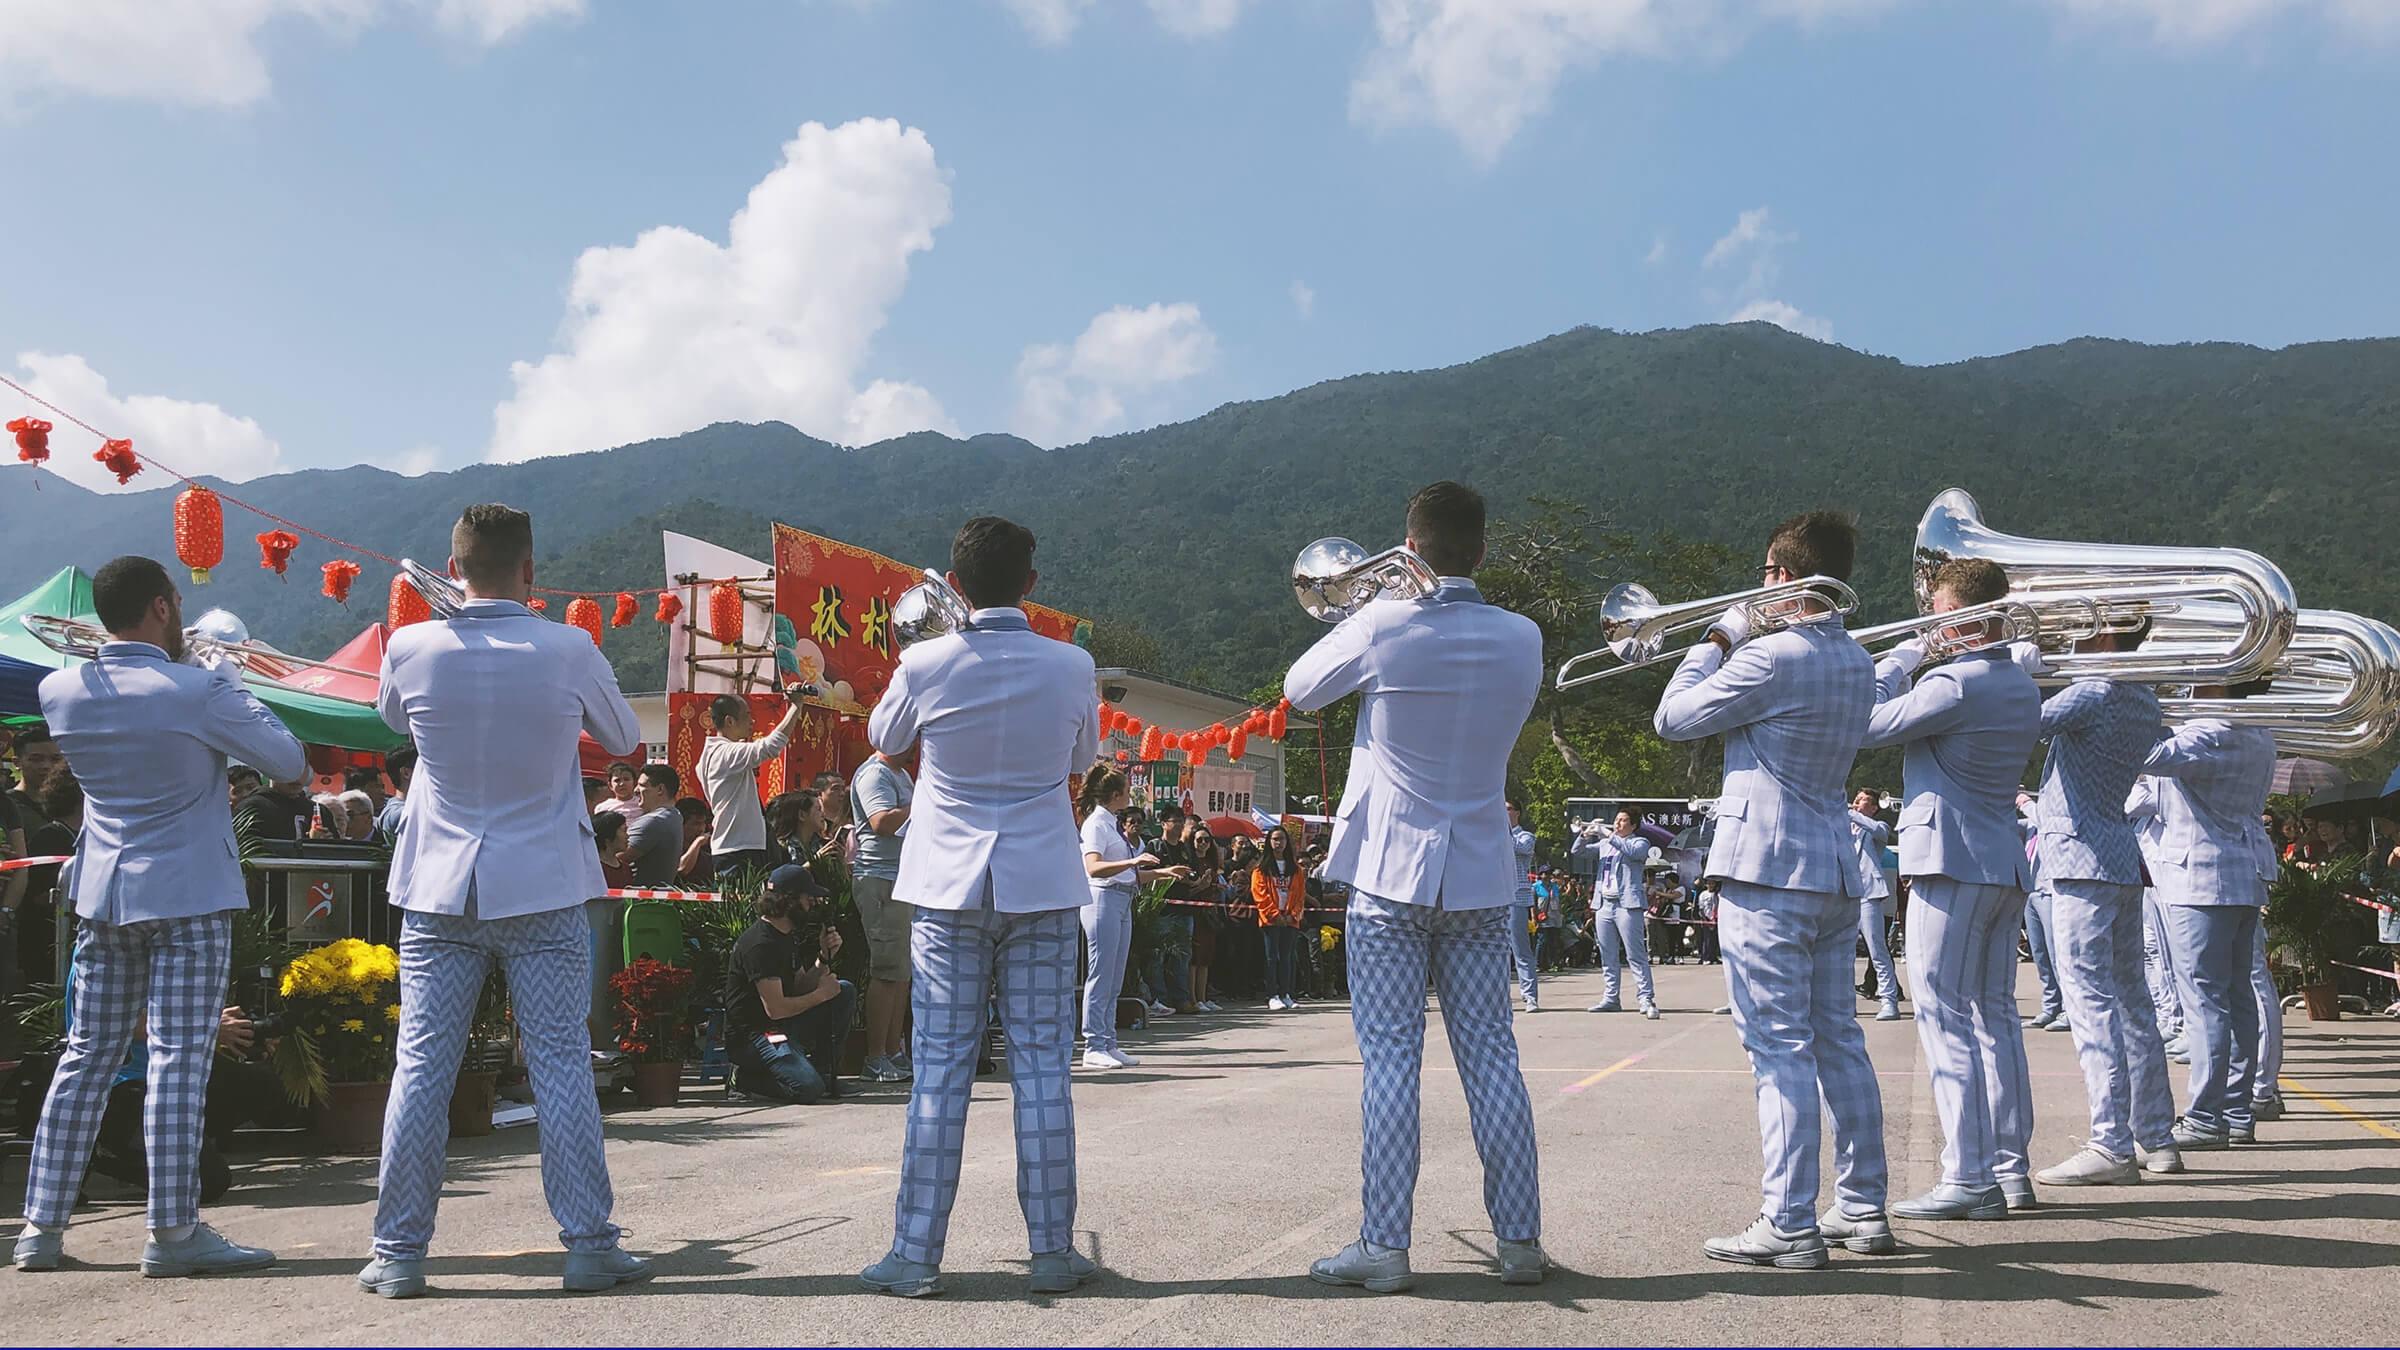 Bloo Voyage: Bluecoats dazzle in Hong Kong